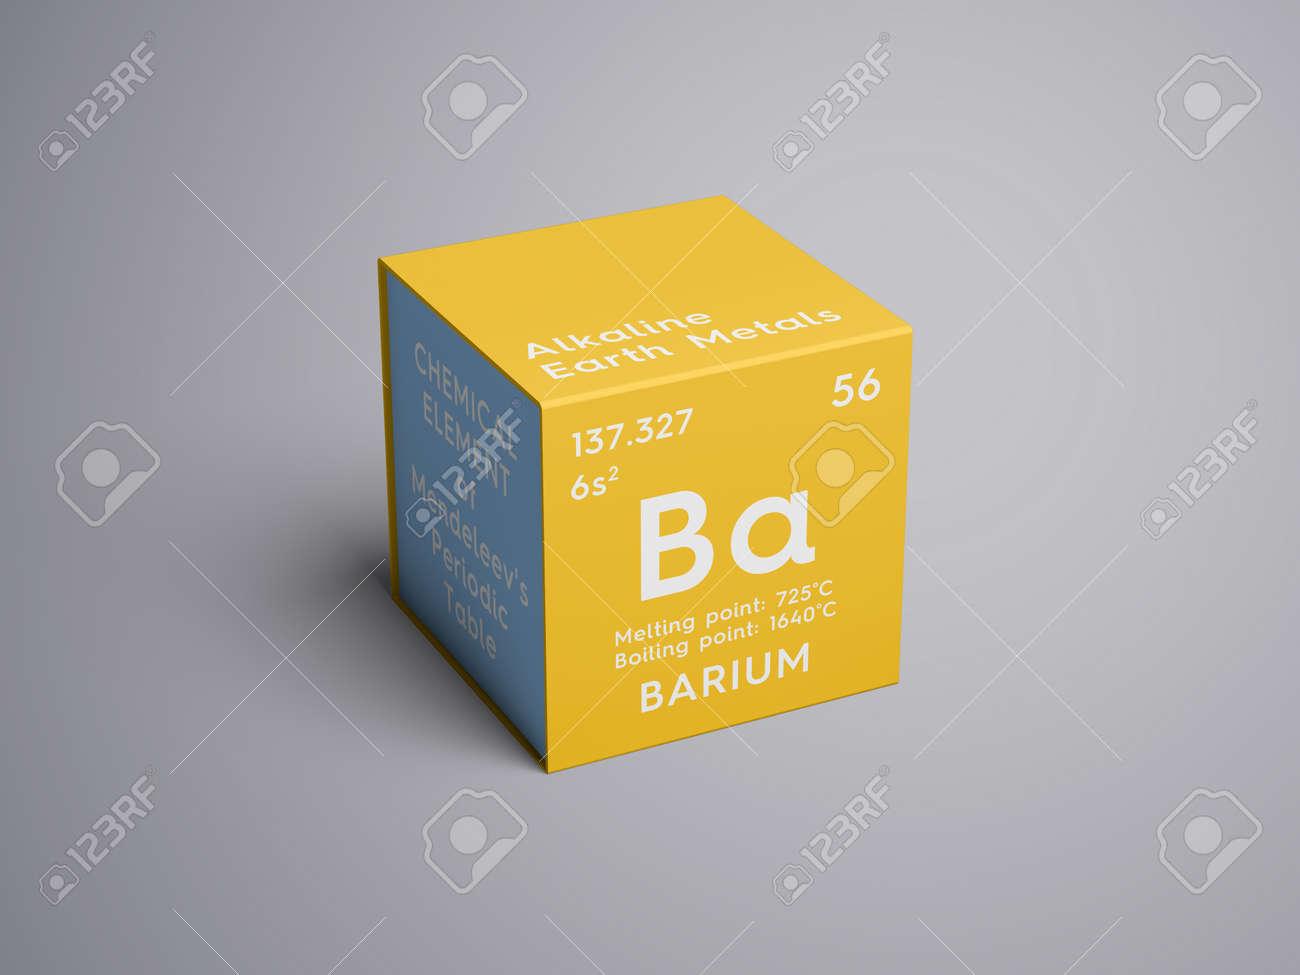 alkaline earth metals chemical element of mendeleevs periodic table barium in square - Periodic Table Elements Alkaline Earth Metals